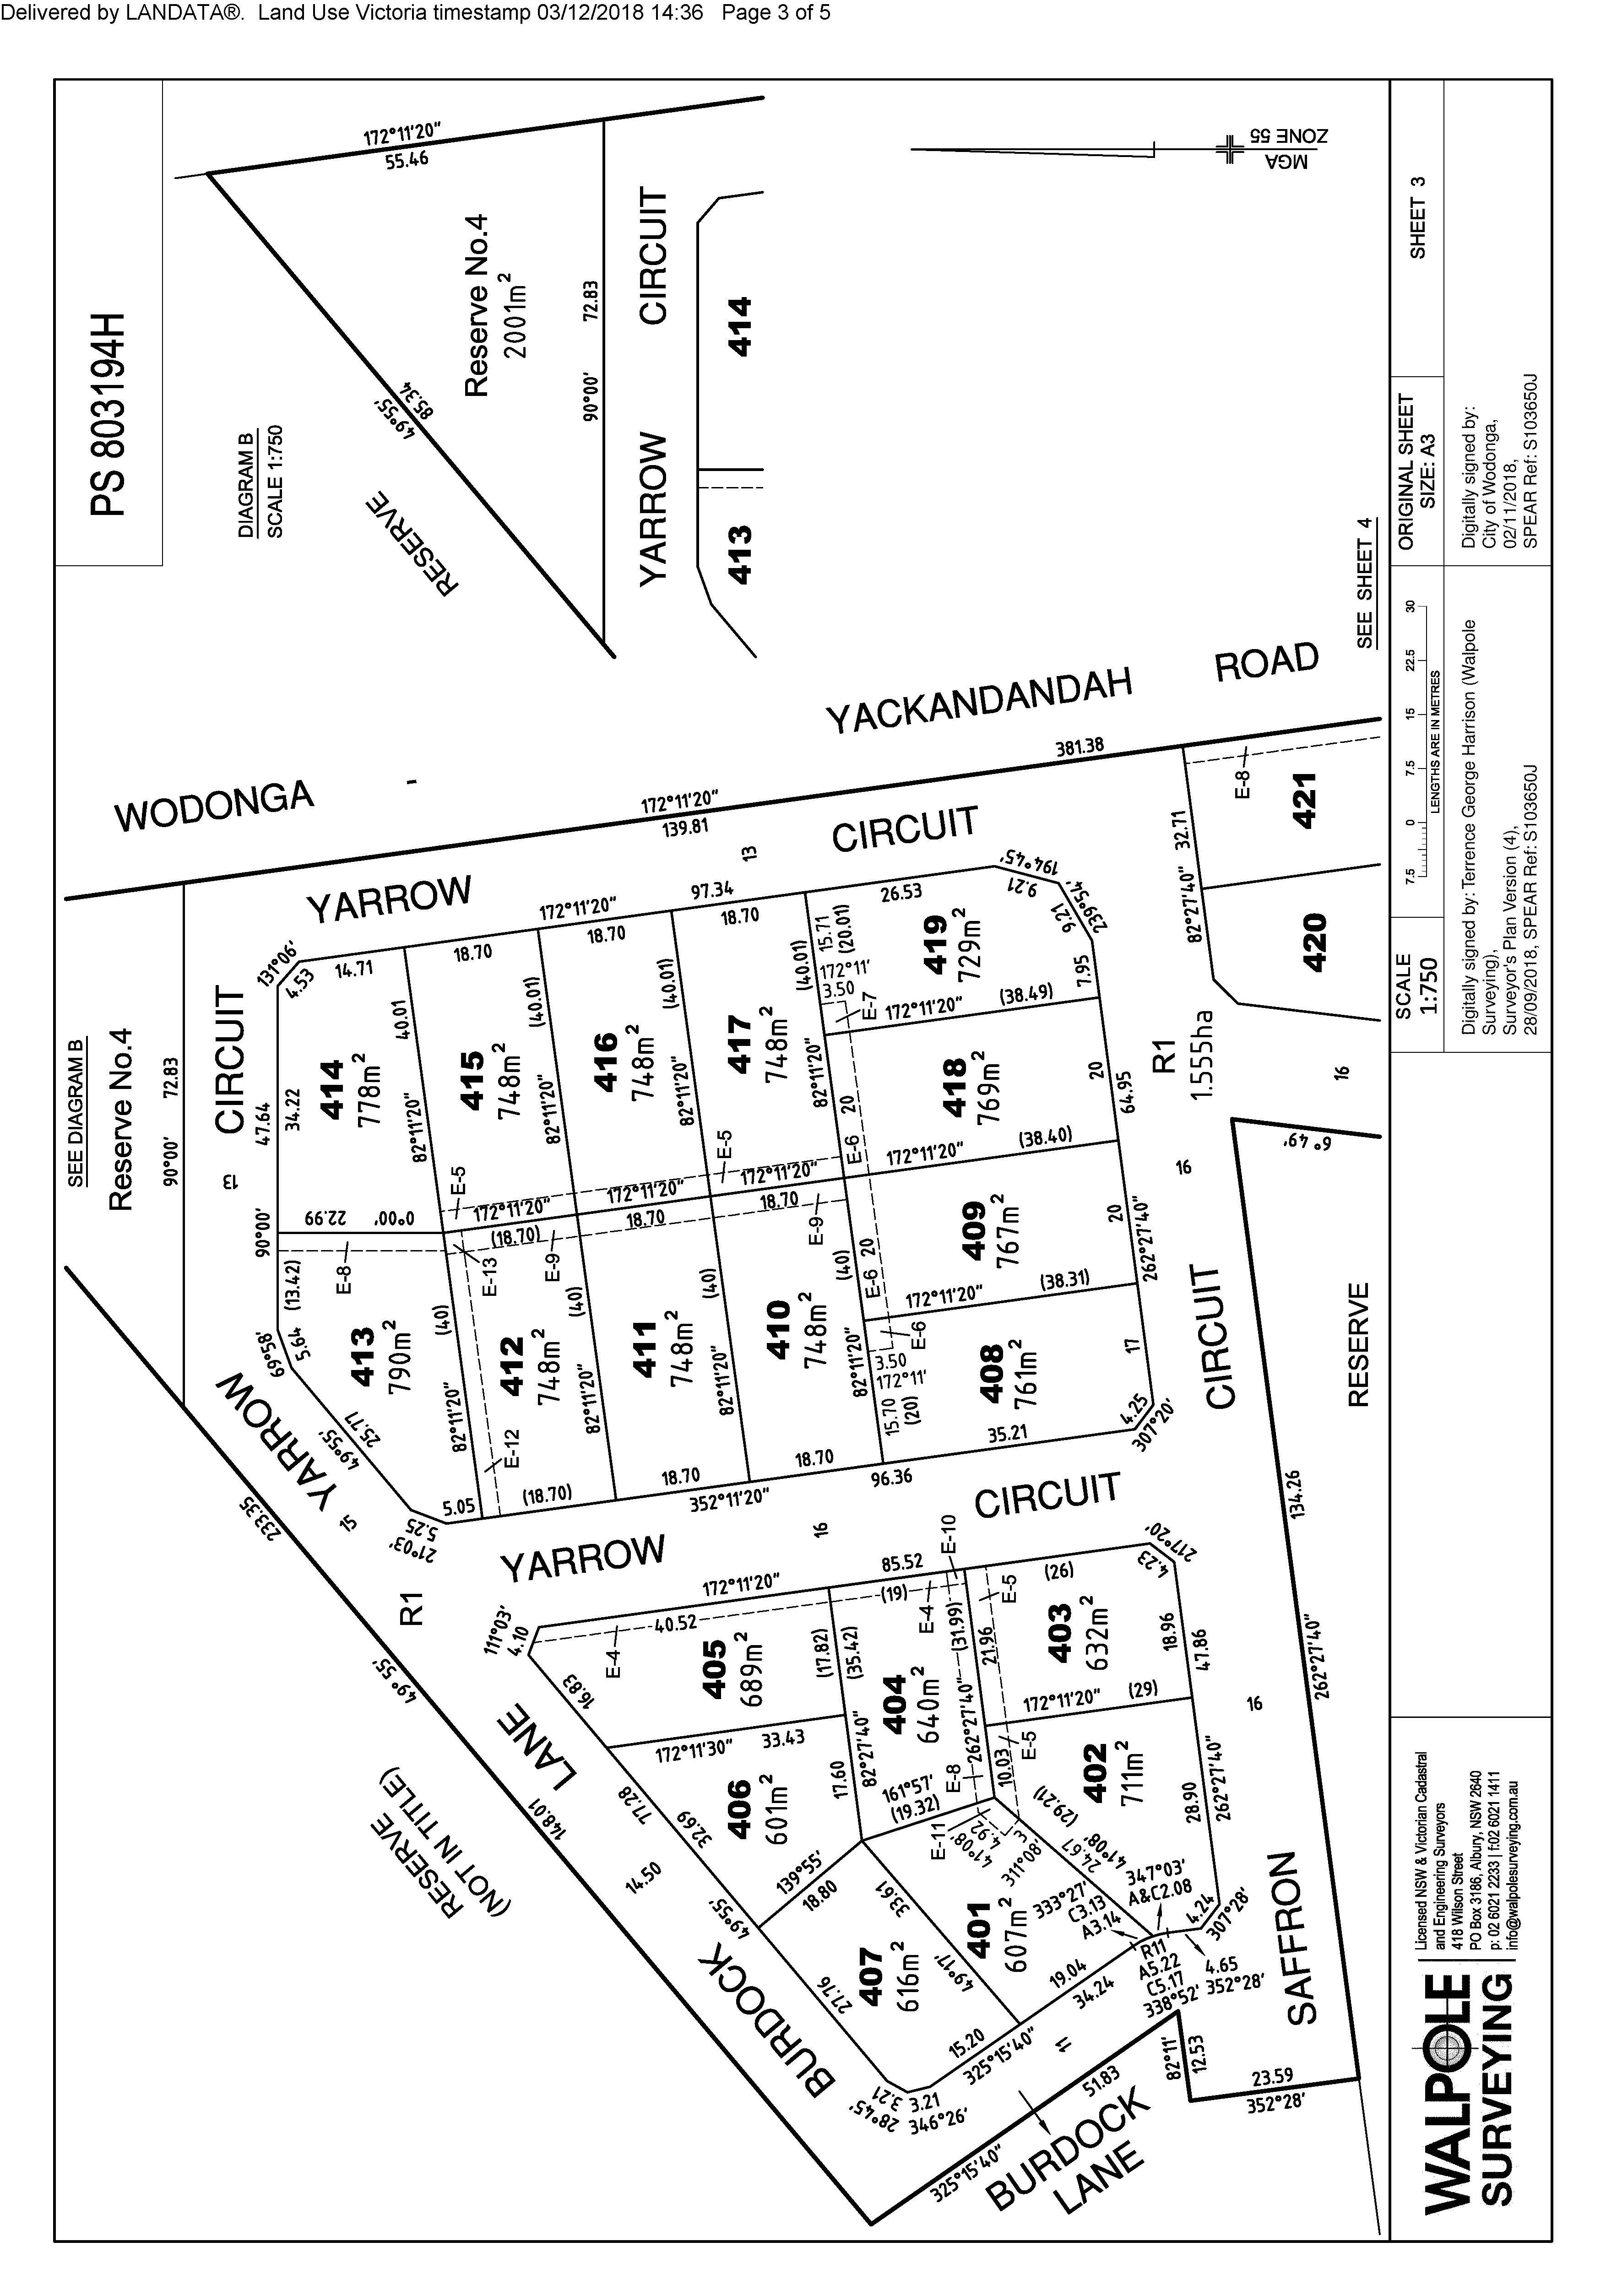 Baranduda-Grove-Stage-1, 3, 4_Page_1.jpg